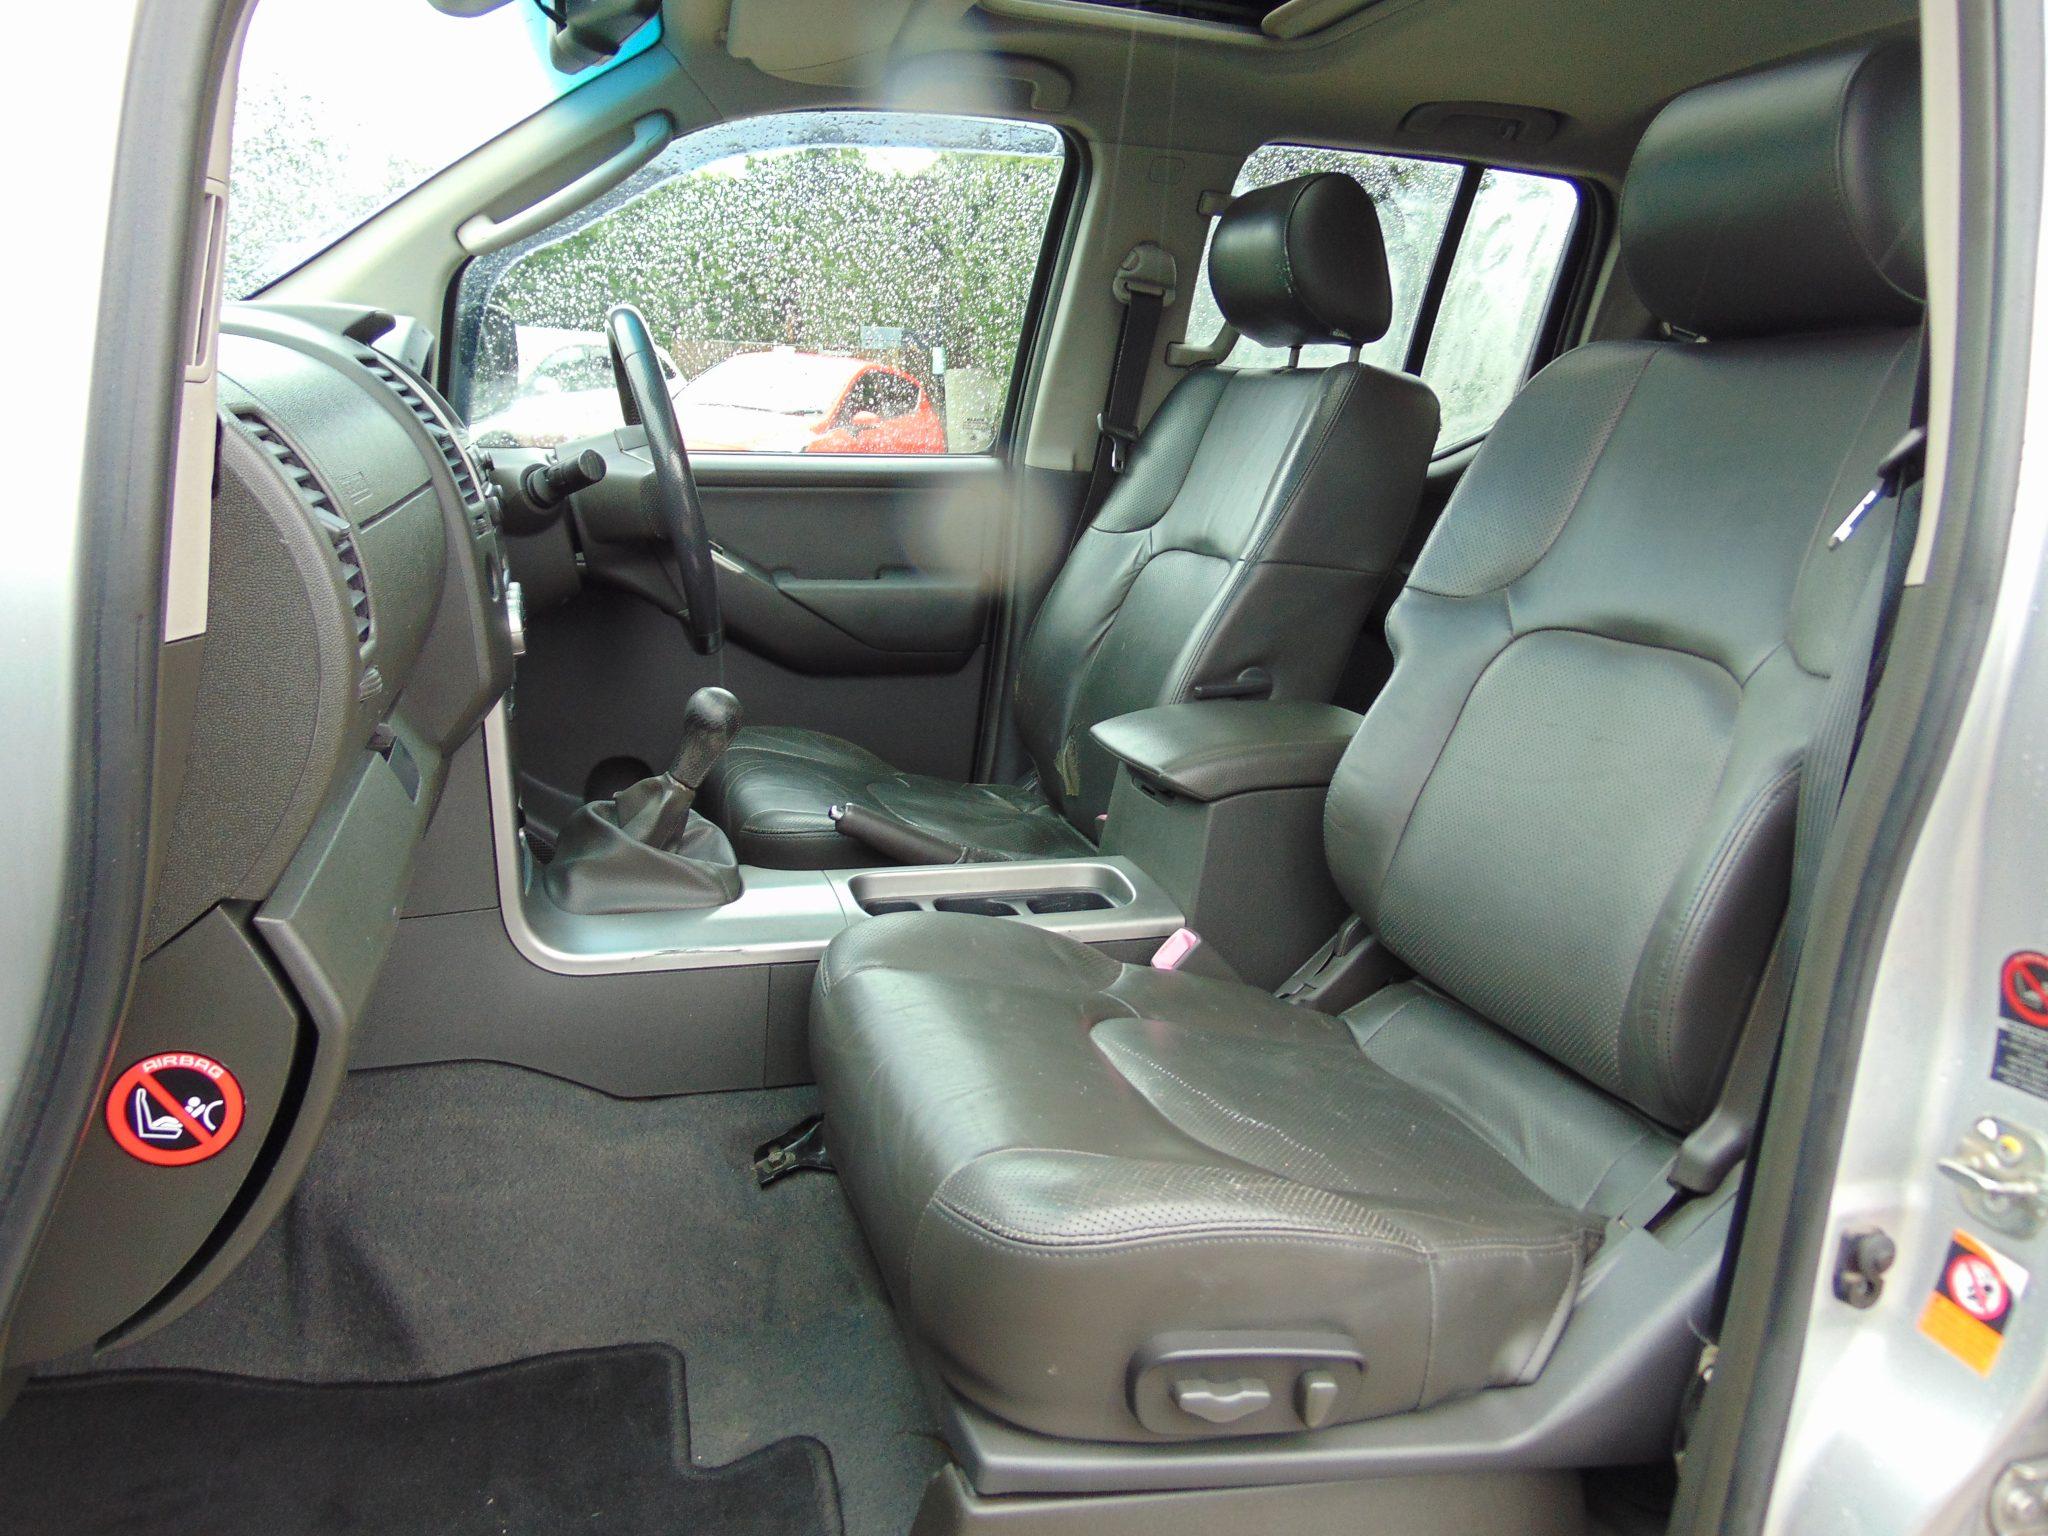 NISSAN NAVARA 2 5 DCI AVENTURA | Simon York Car Sales